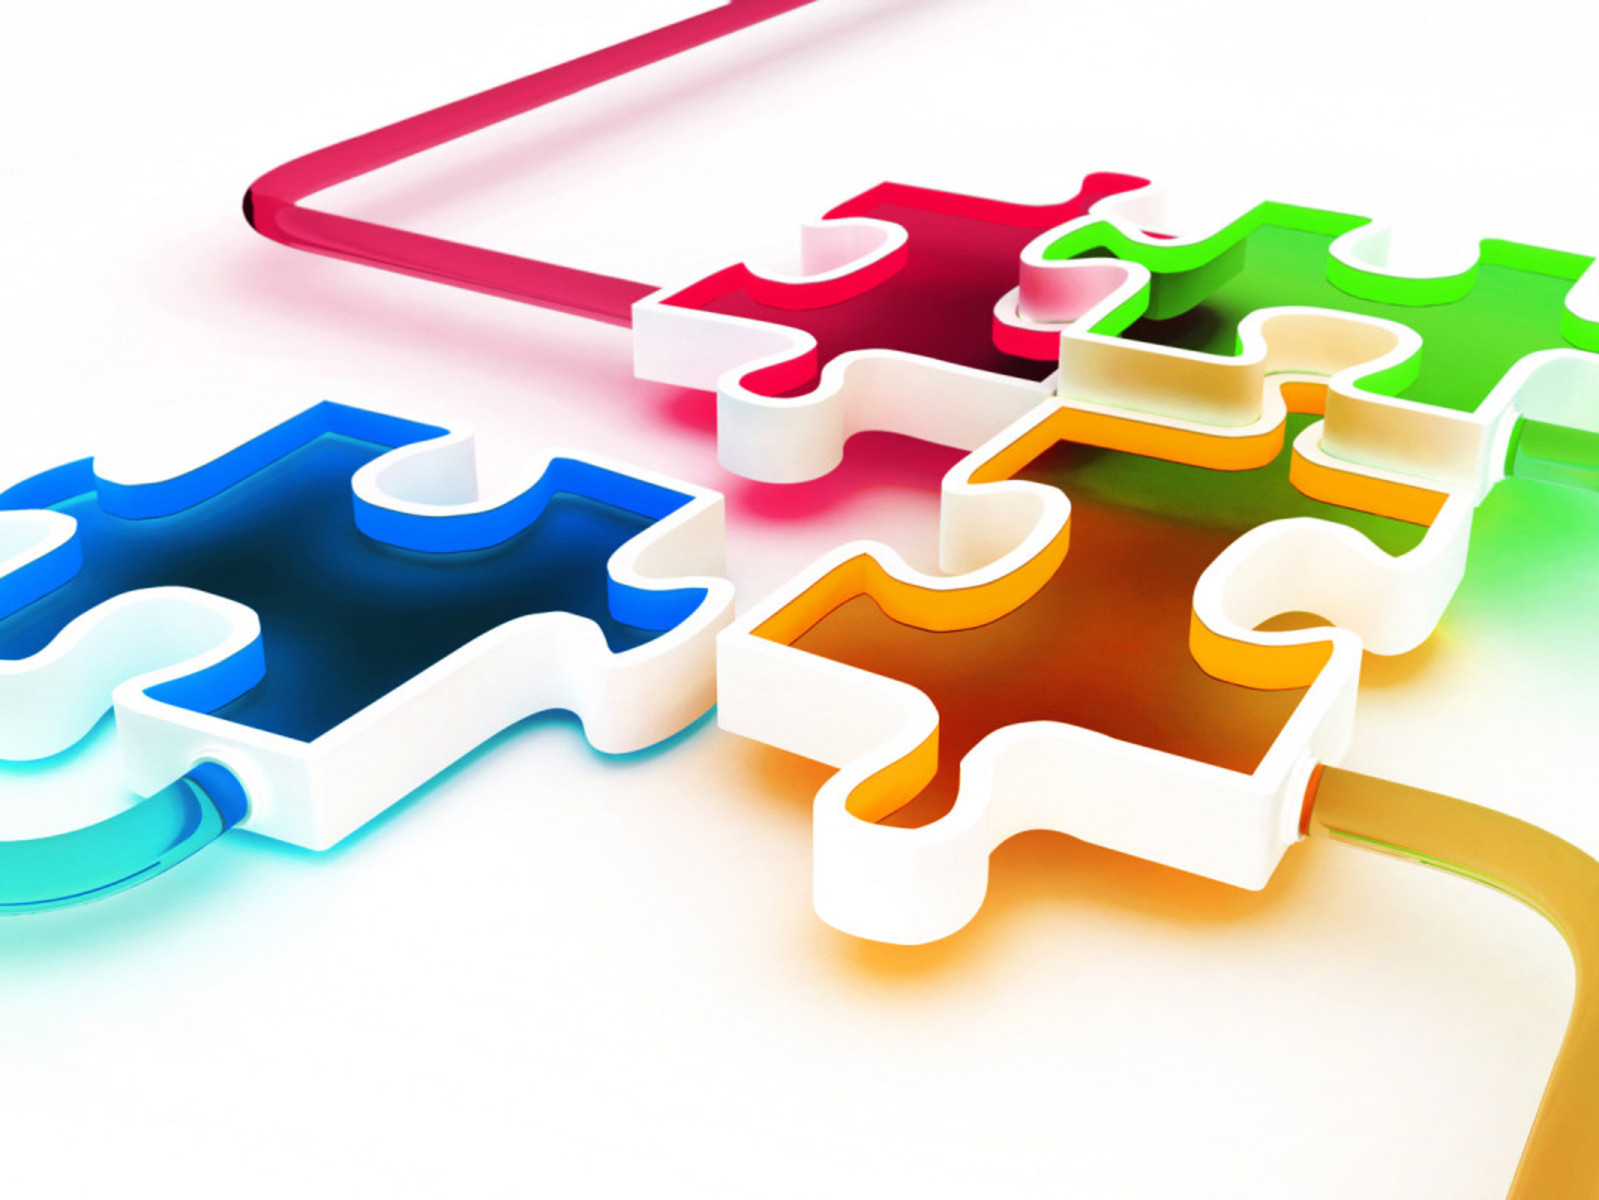 3d puzzle wallpaper 52999